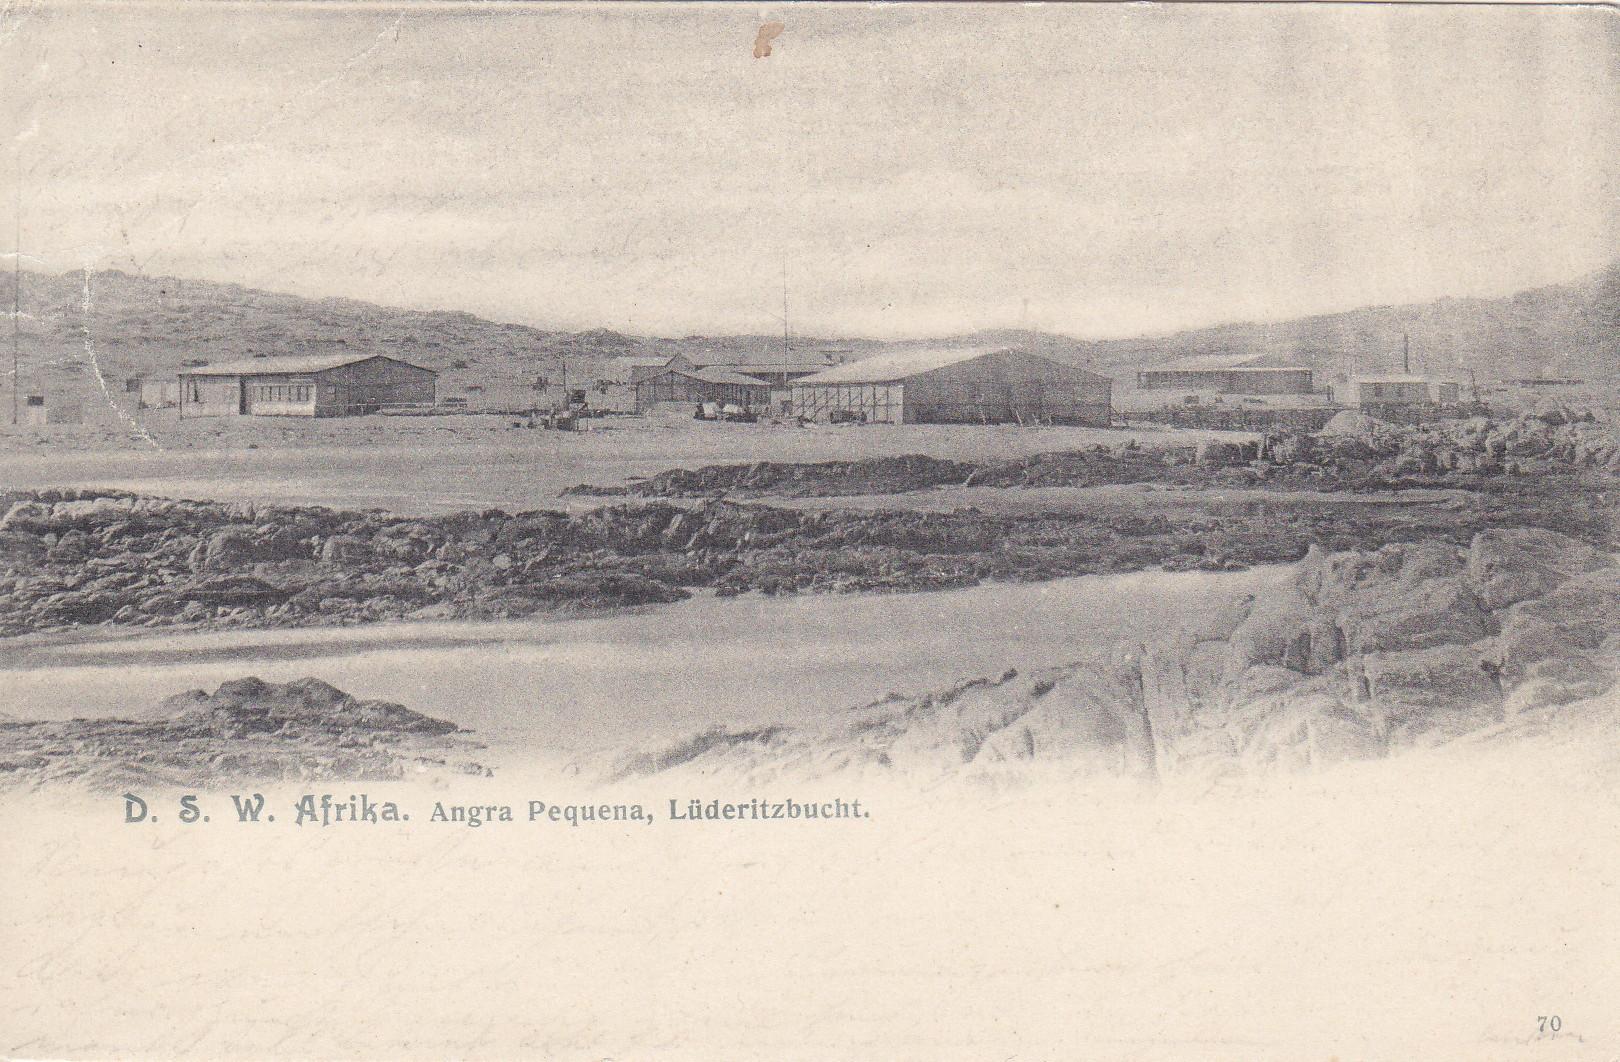 Angra Pequena, Lüderitzbucht